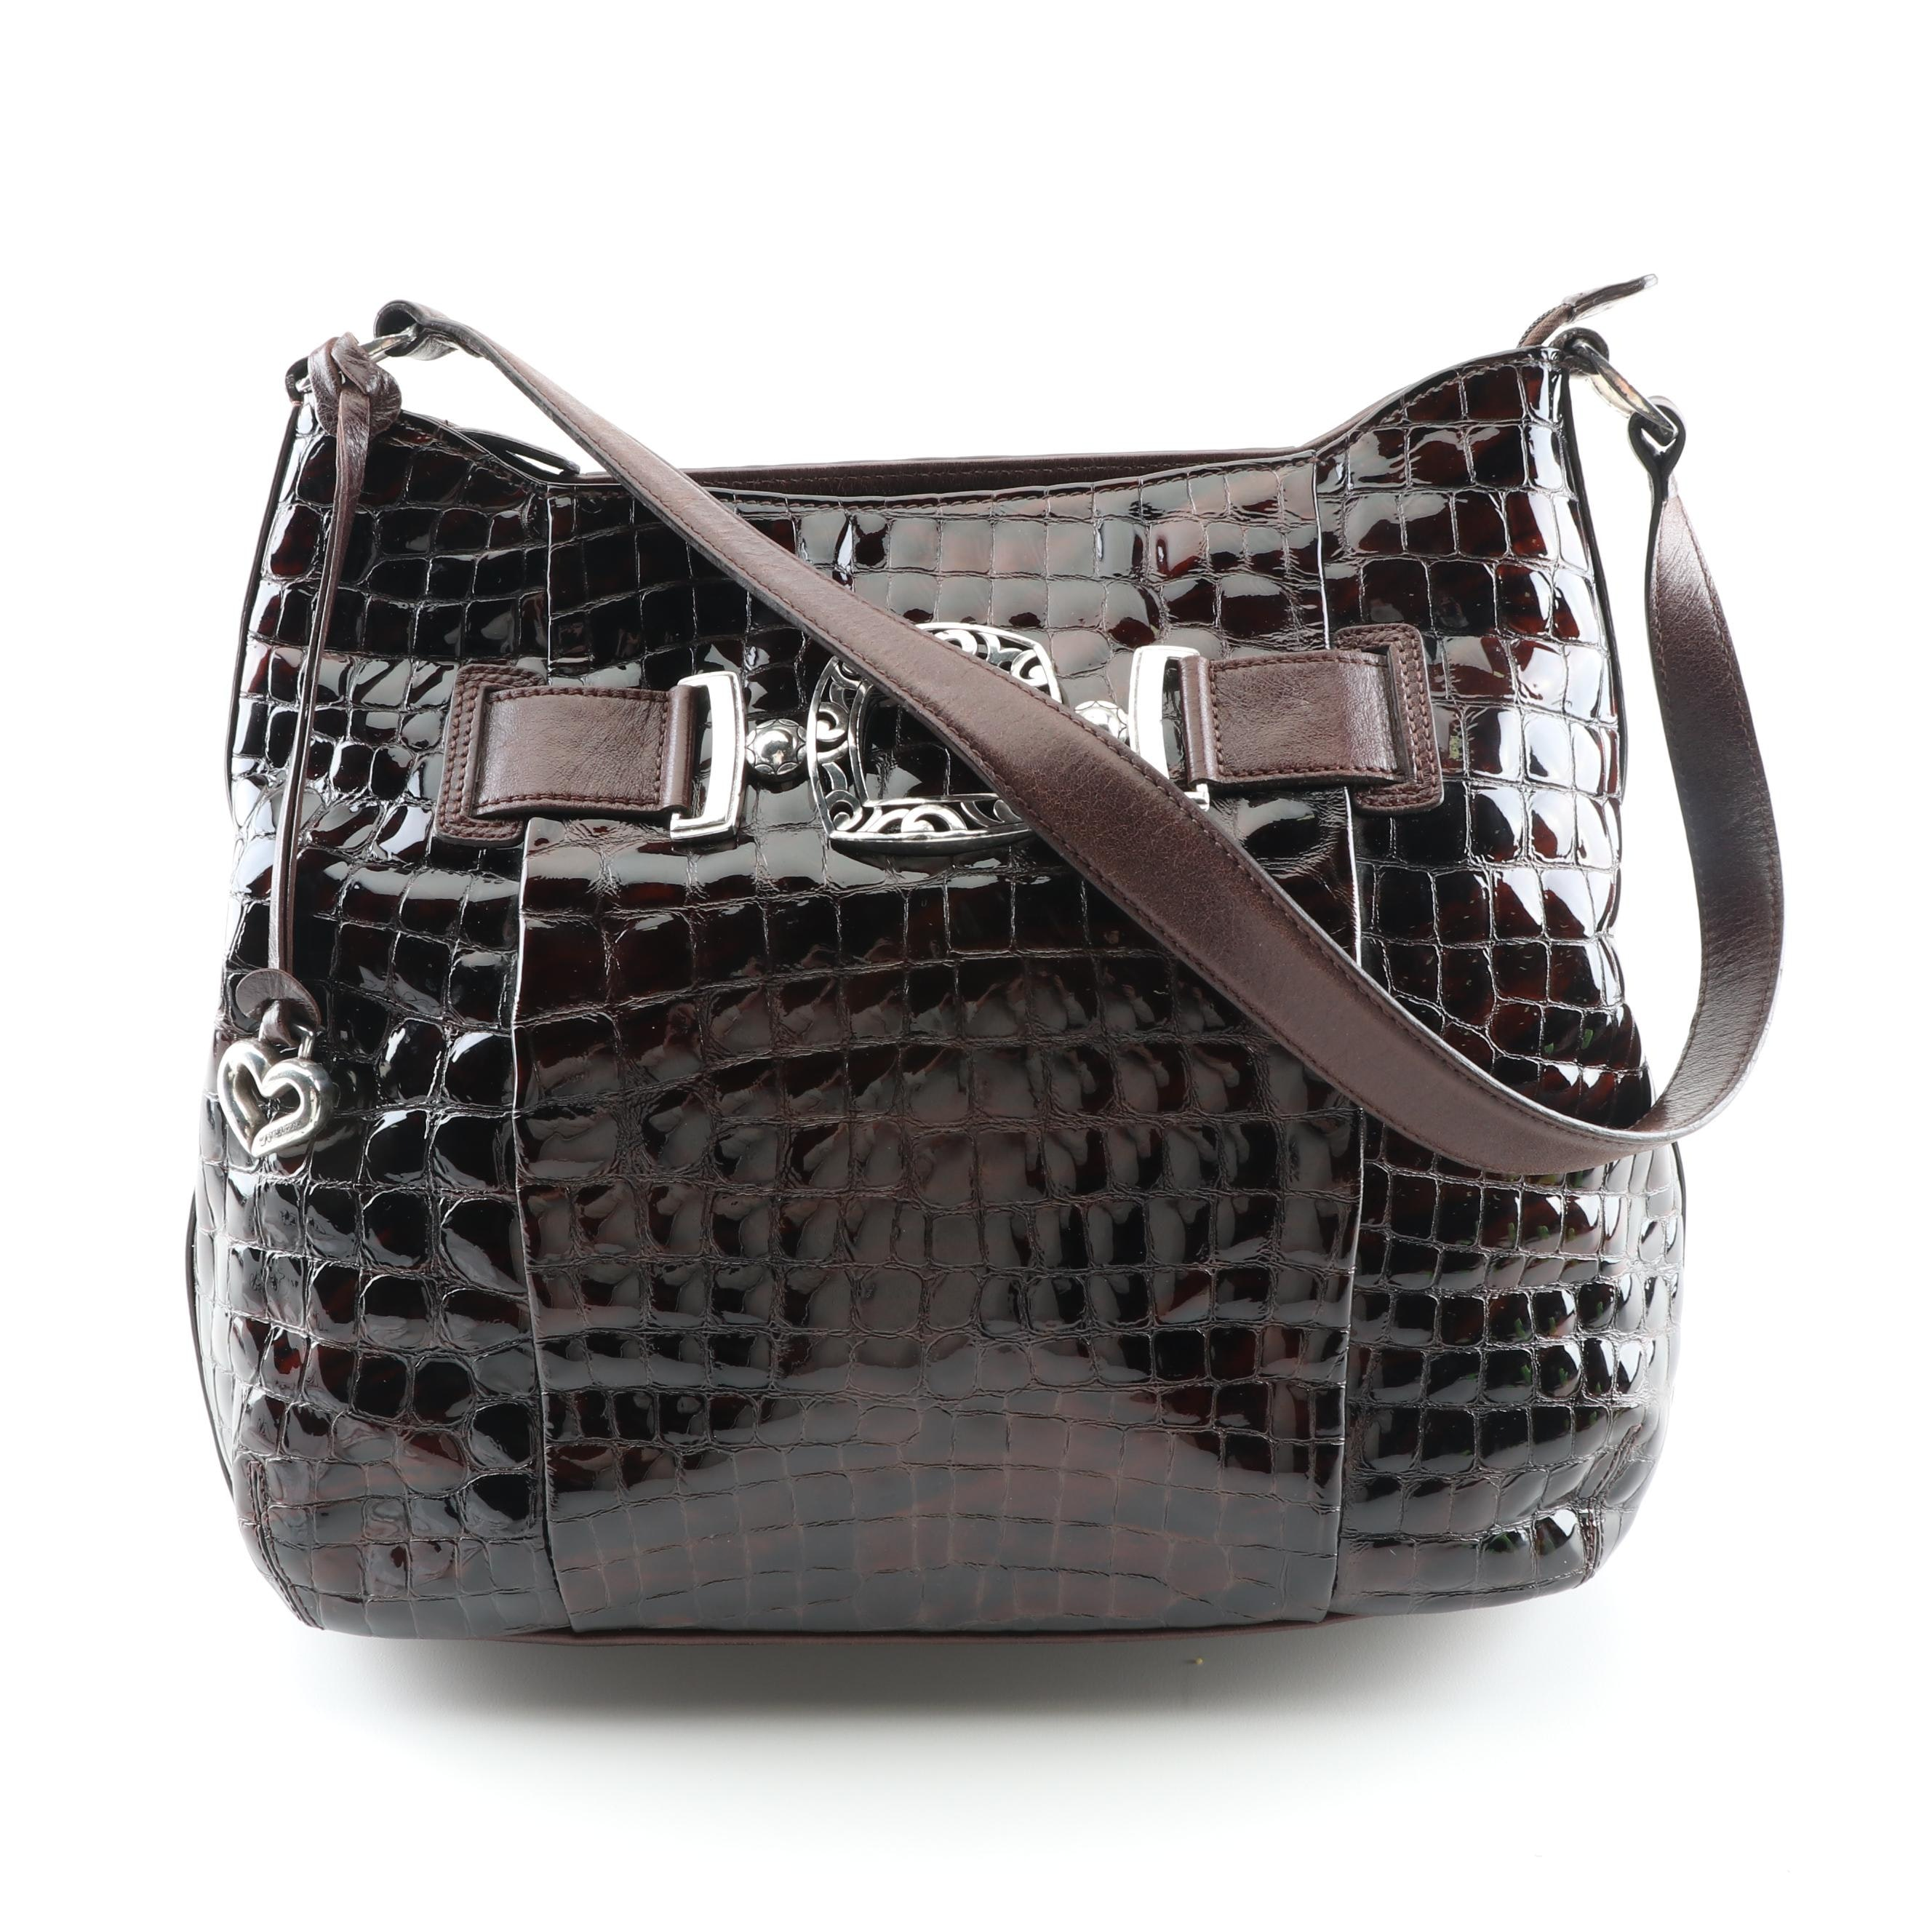 Brighton Crocodile Embossed Patent Leather Handbag